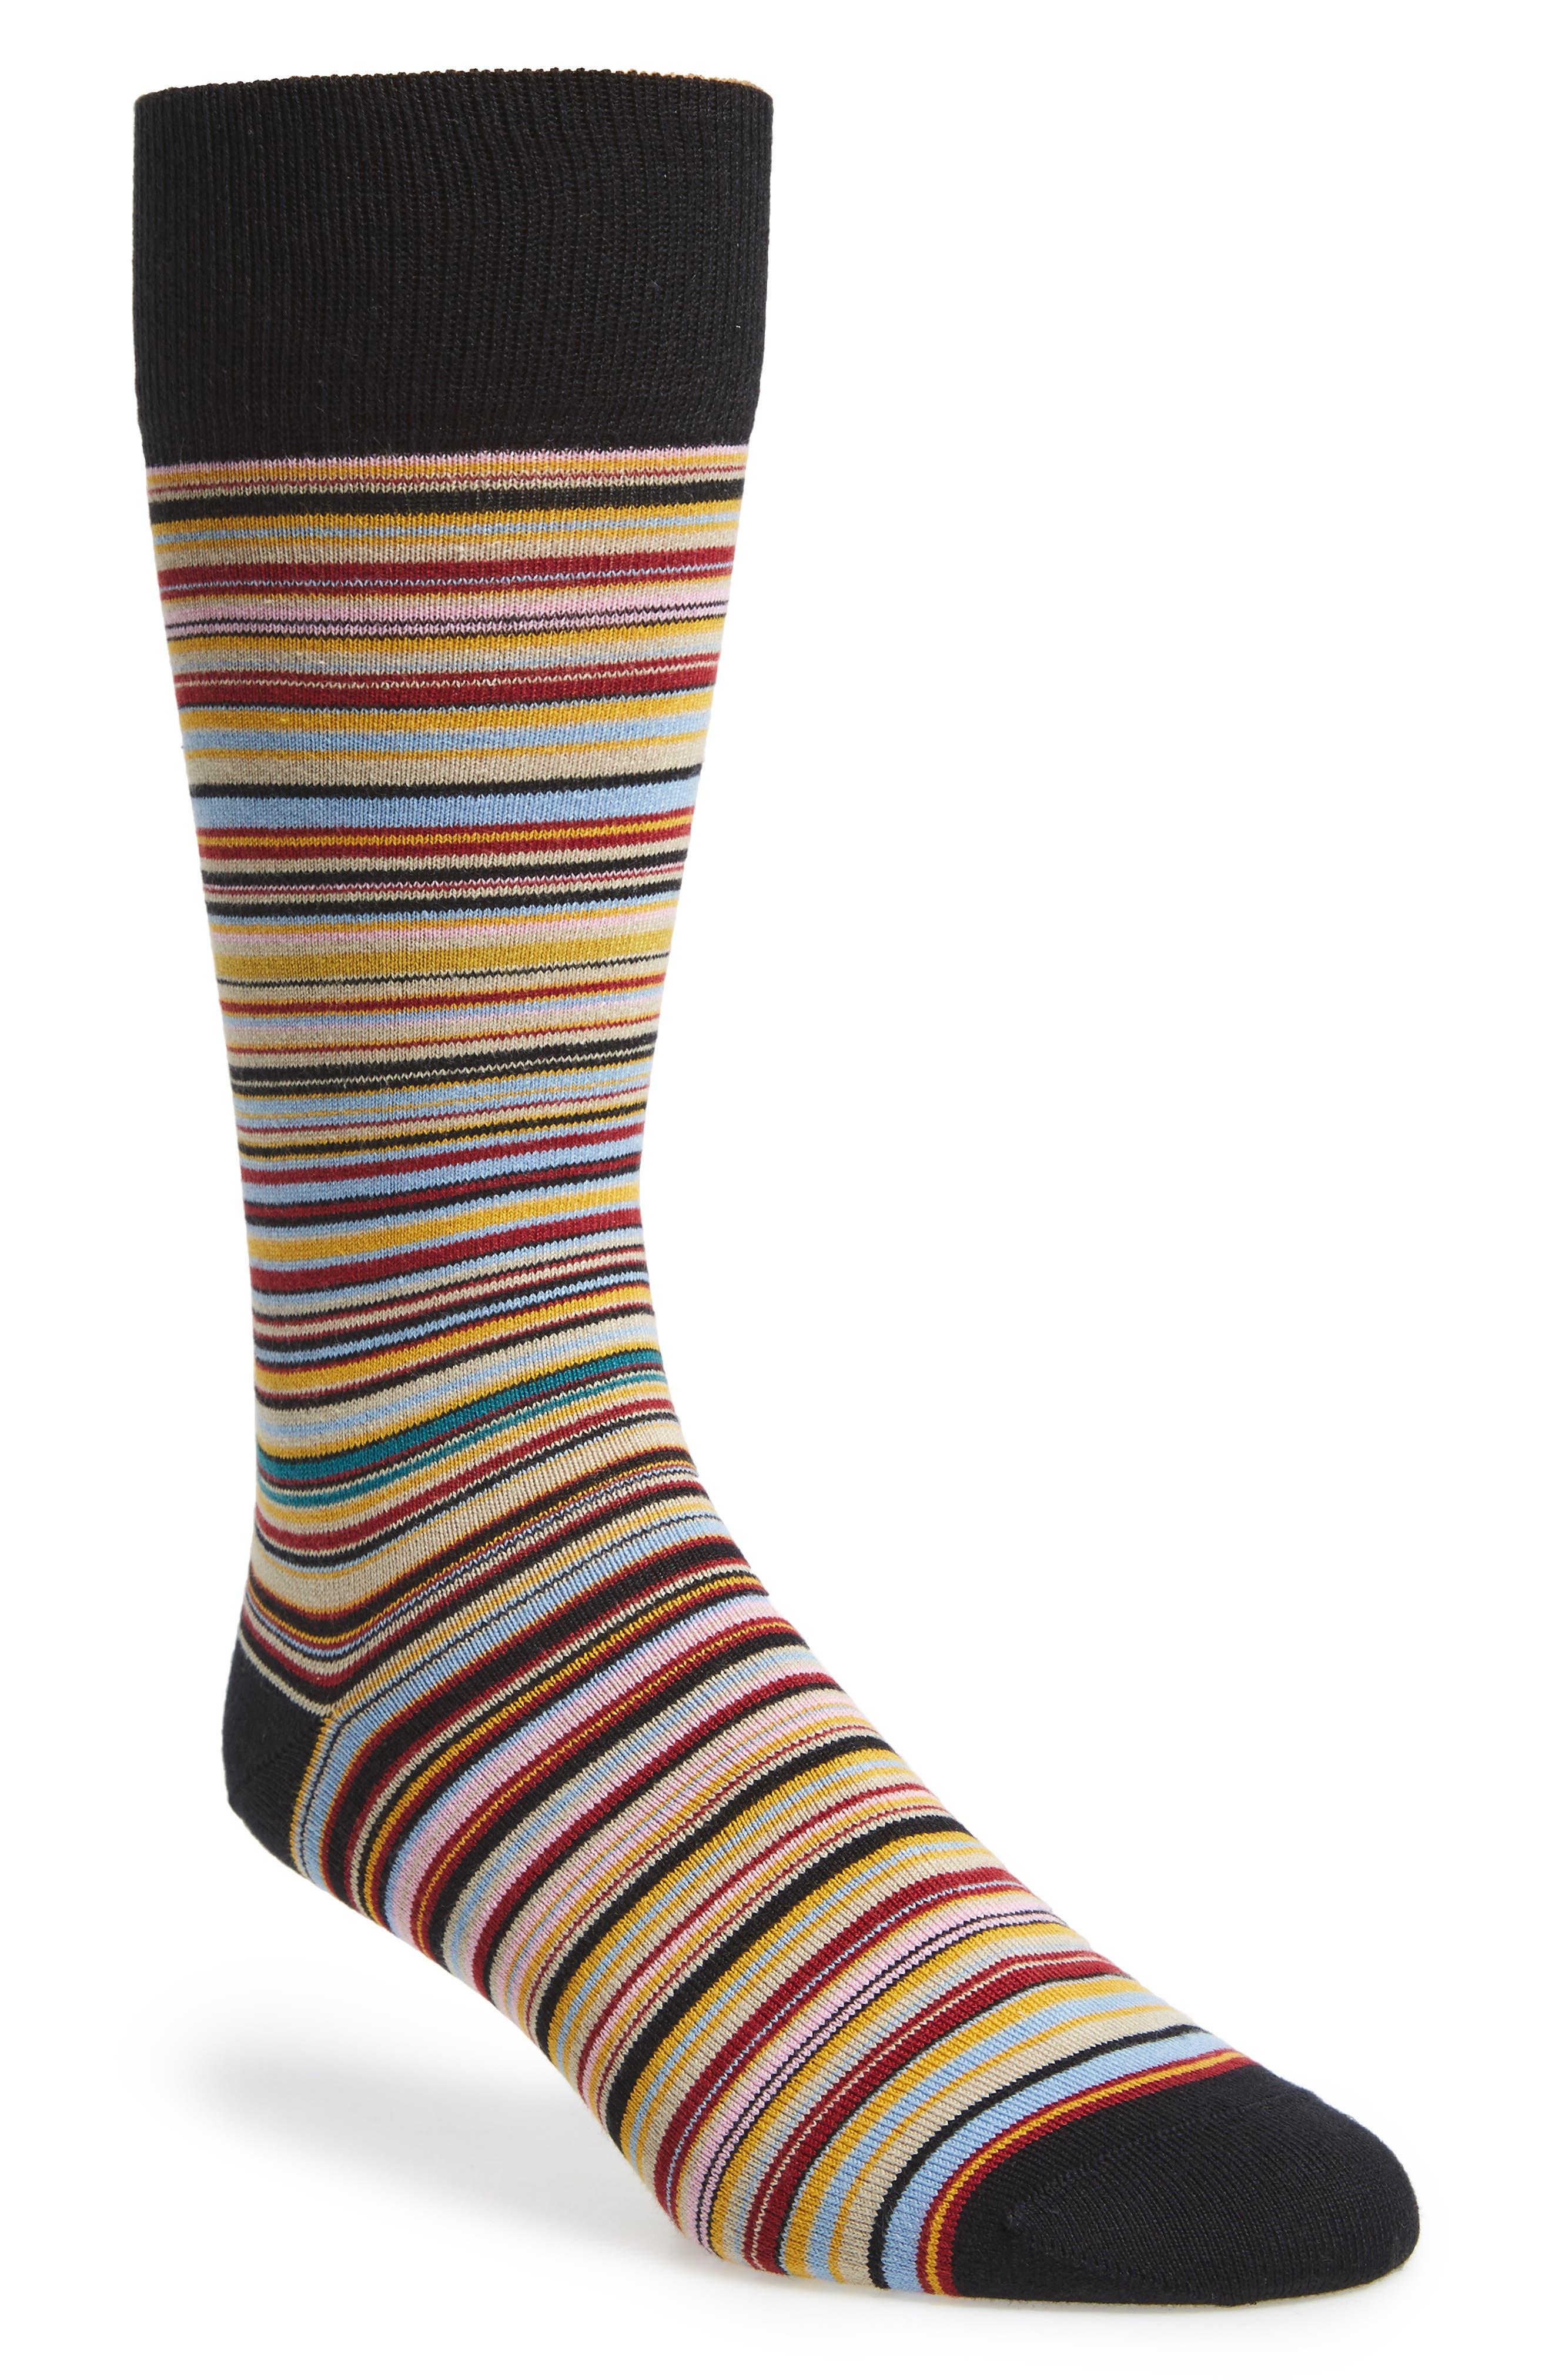 Alternate Image 1 Selected - Paul Smith Stripe Socks